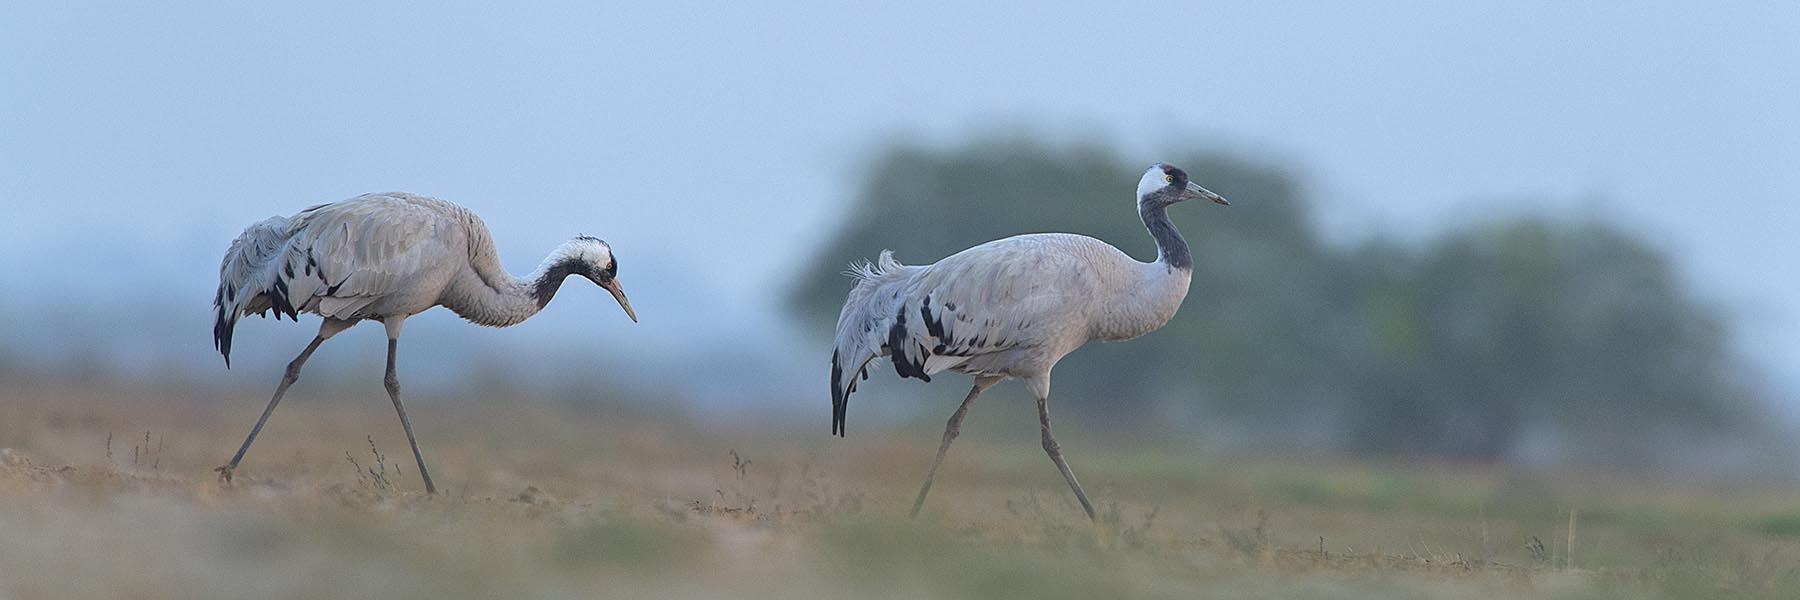 Gujarat Wildlife